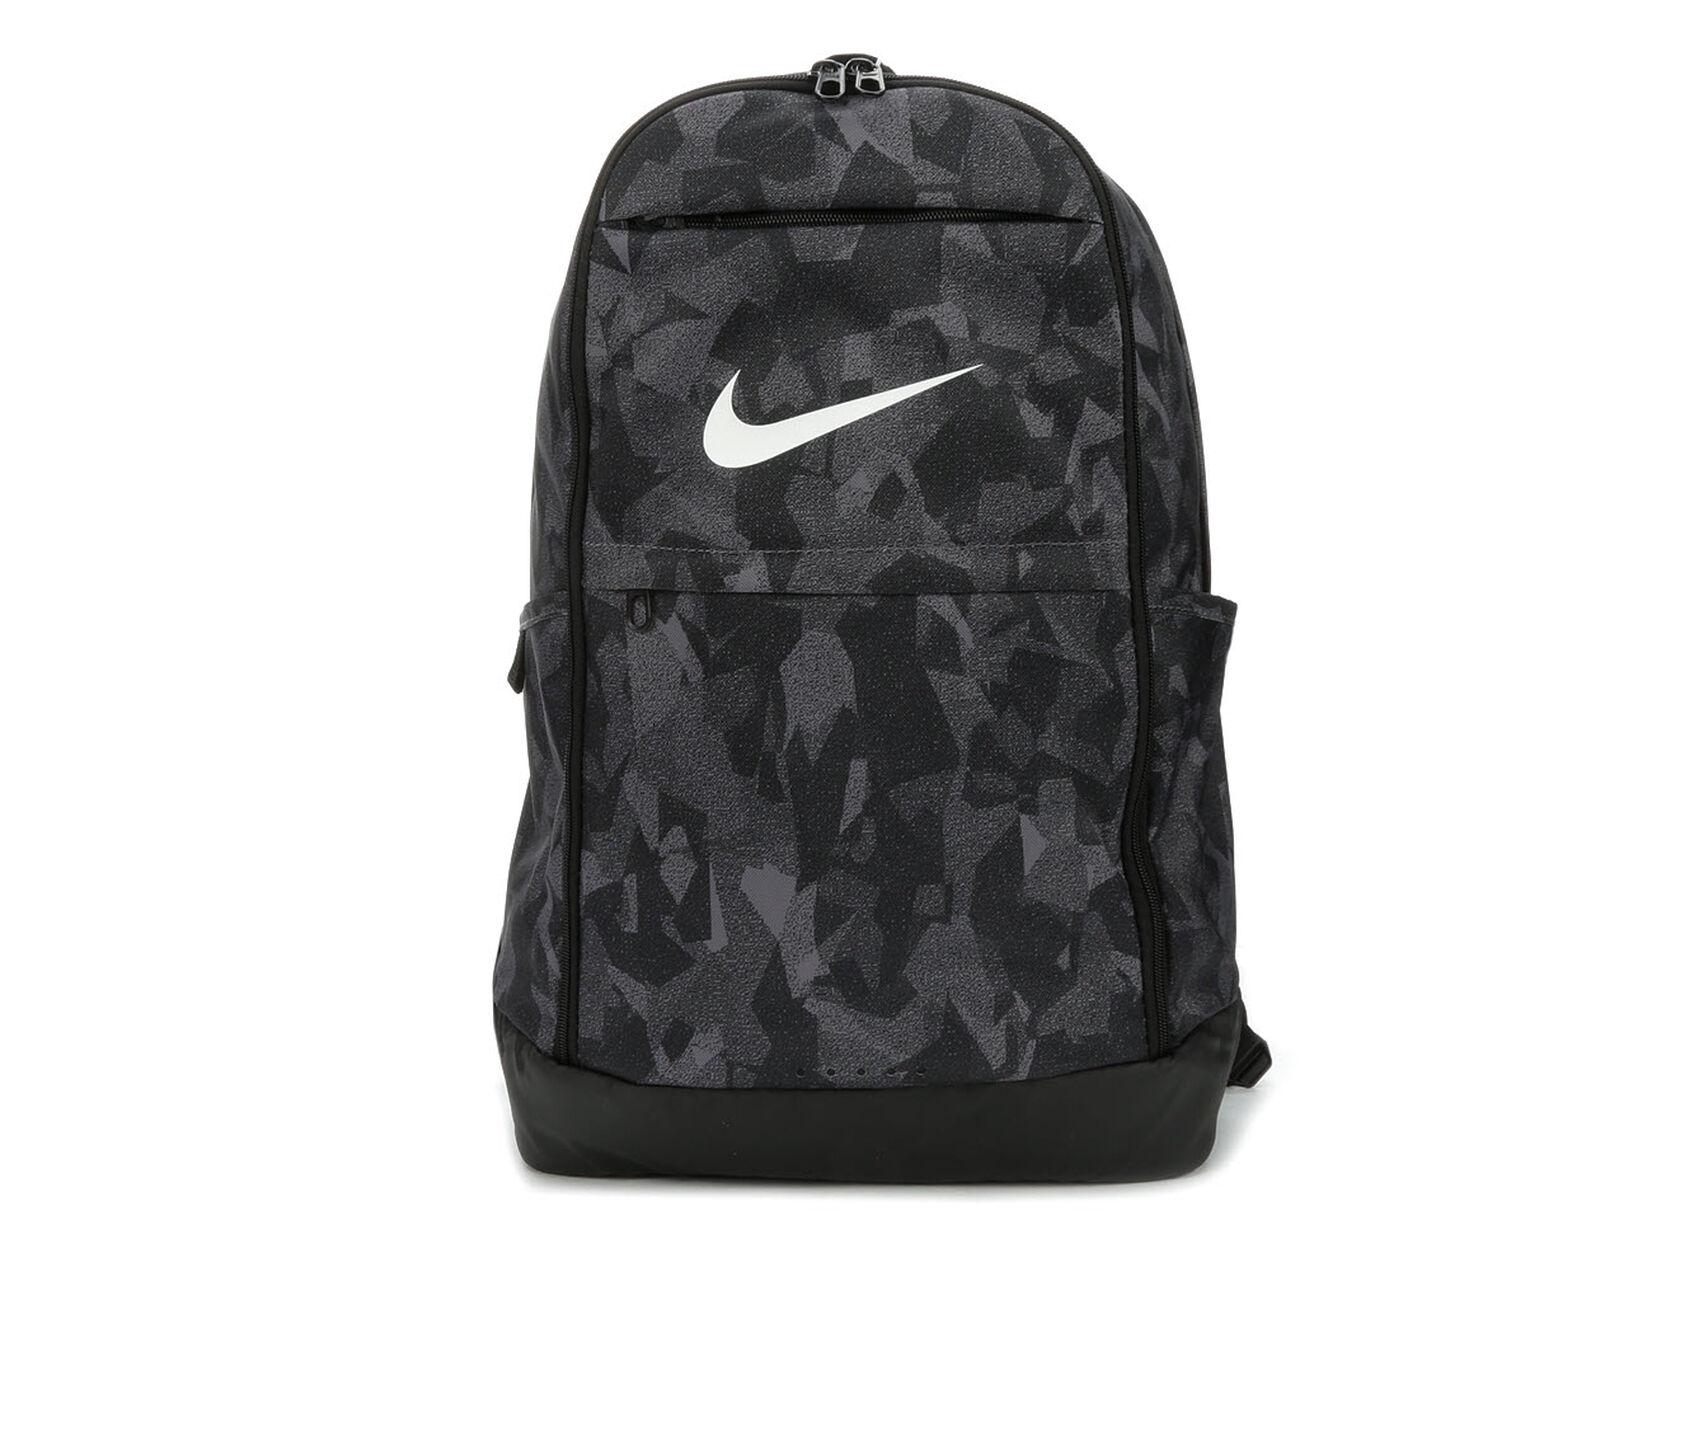 b22e770bf9d Nike Brasilia XL Graphic Backpack | Shoe Carnival